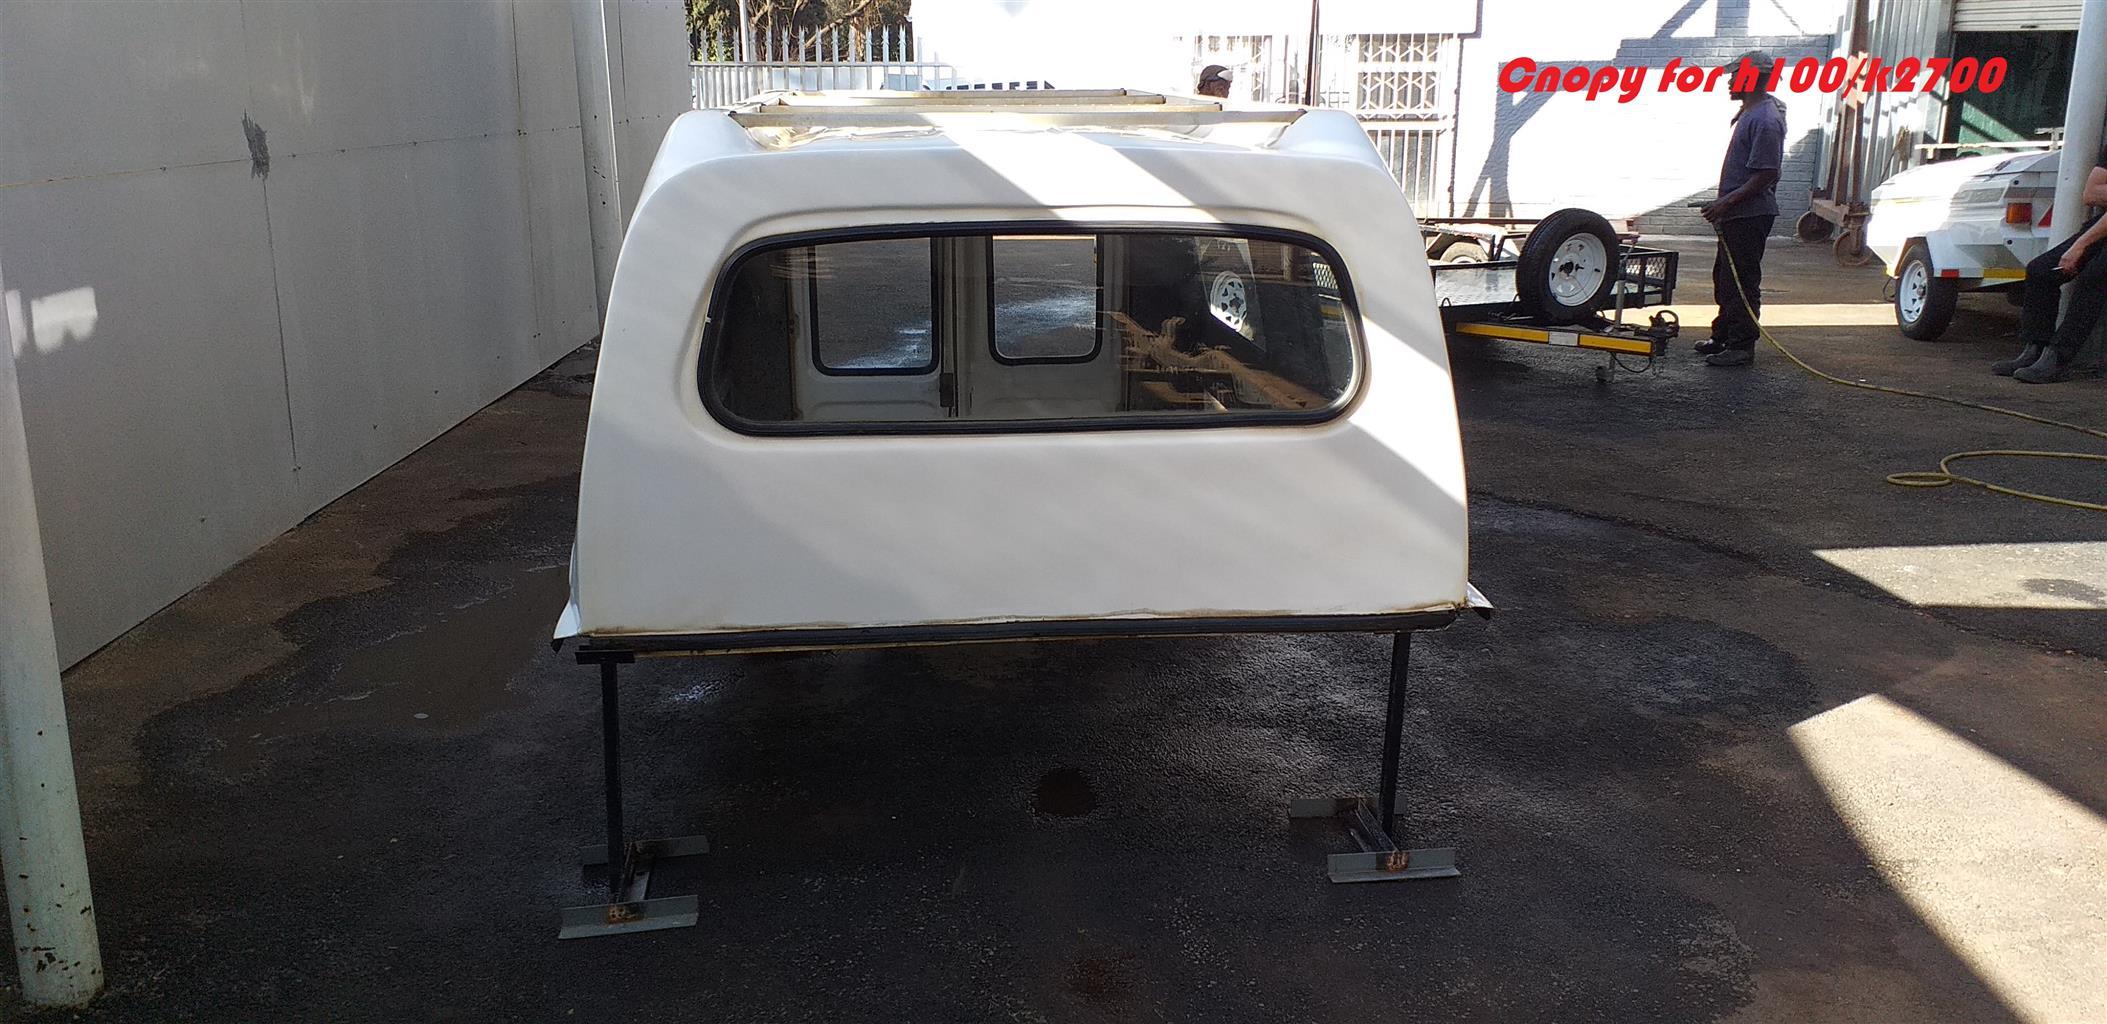 H100/K2700 canopy